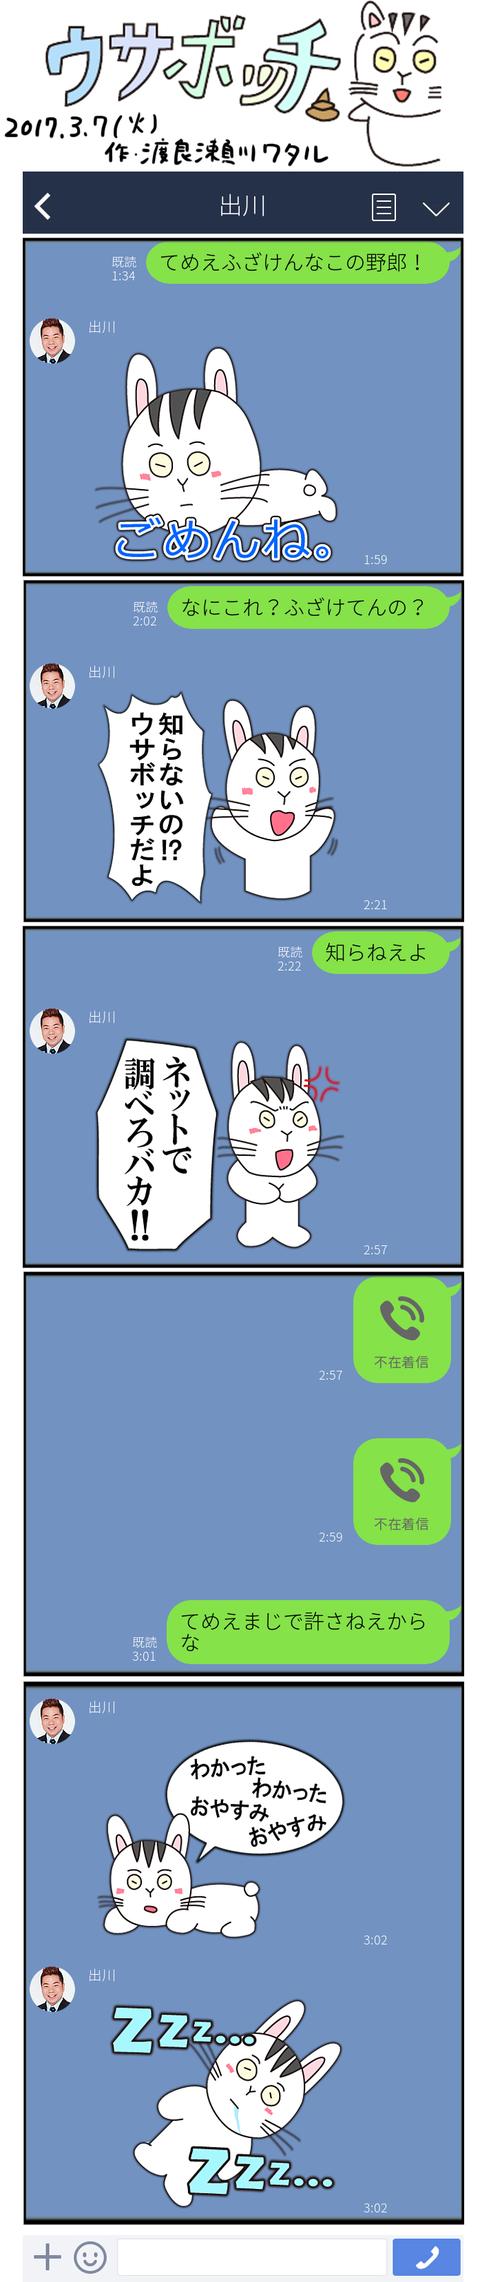 2017_3_7(1)